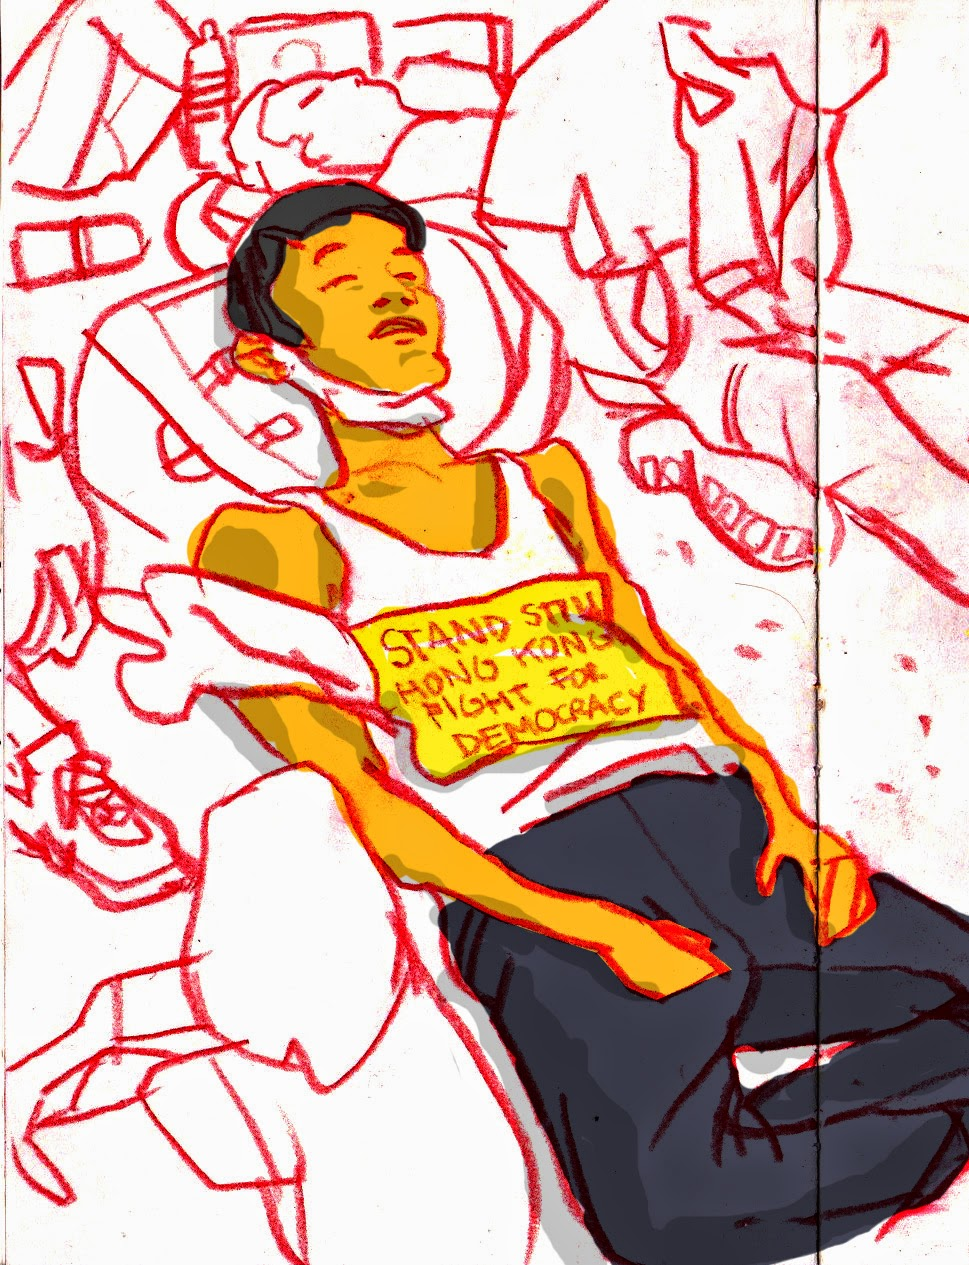 eyewitness sketches of hong kong pro democracy protests Bermuda Snorkeling Map luis simoes